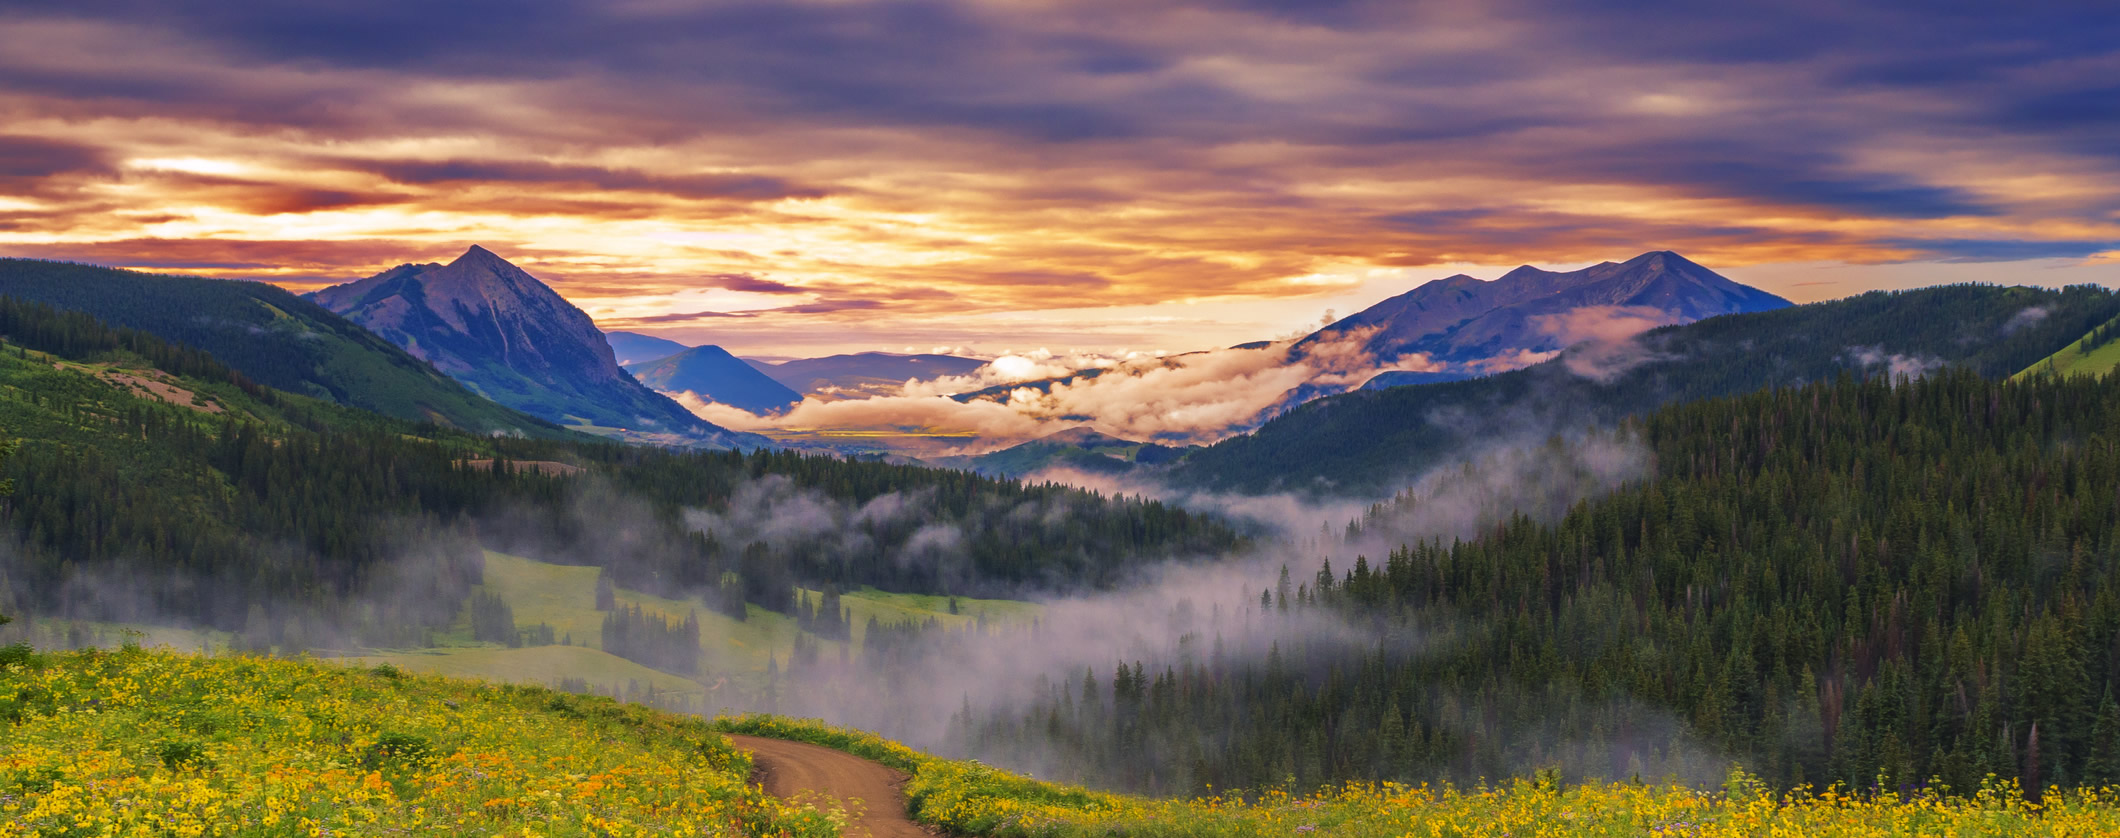 Coloradobanner image